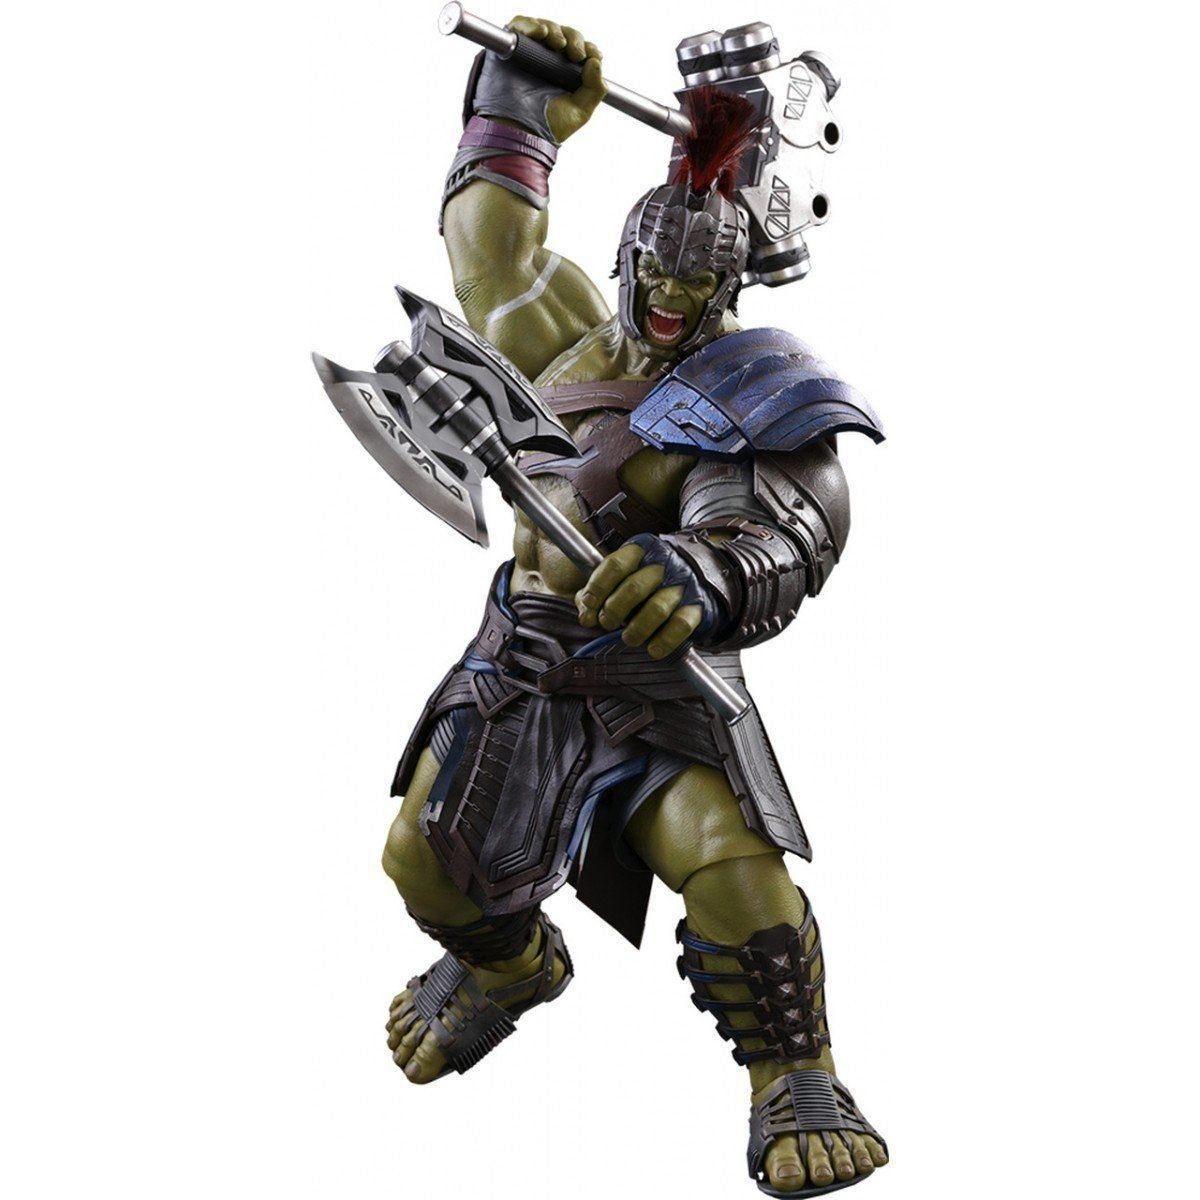 Action Figure Hulk Gladiador (Gladiator): Thor Ragnarok (Escala 1/6) (MMS430) - Hot Toys